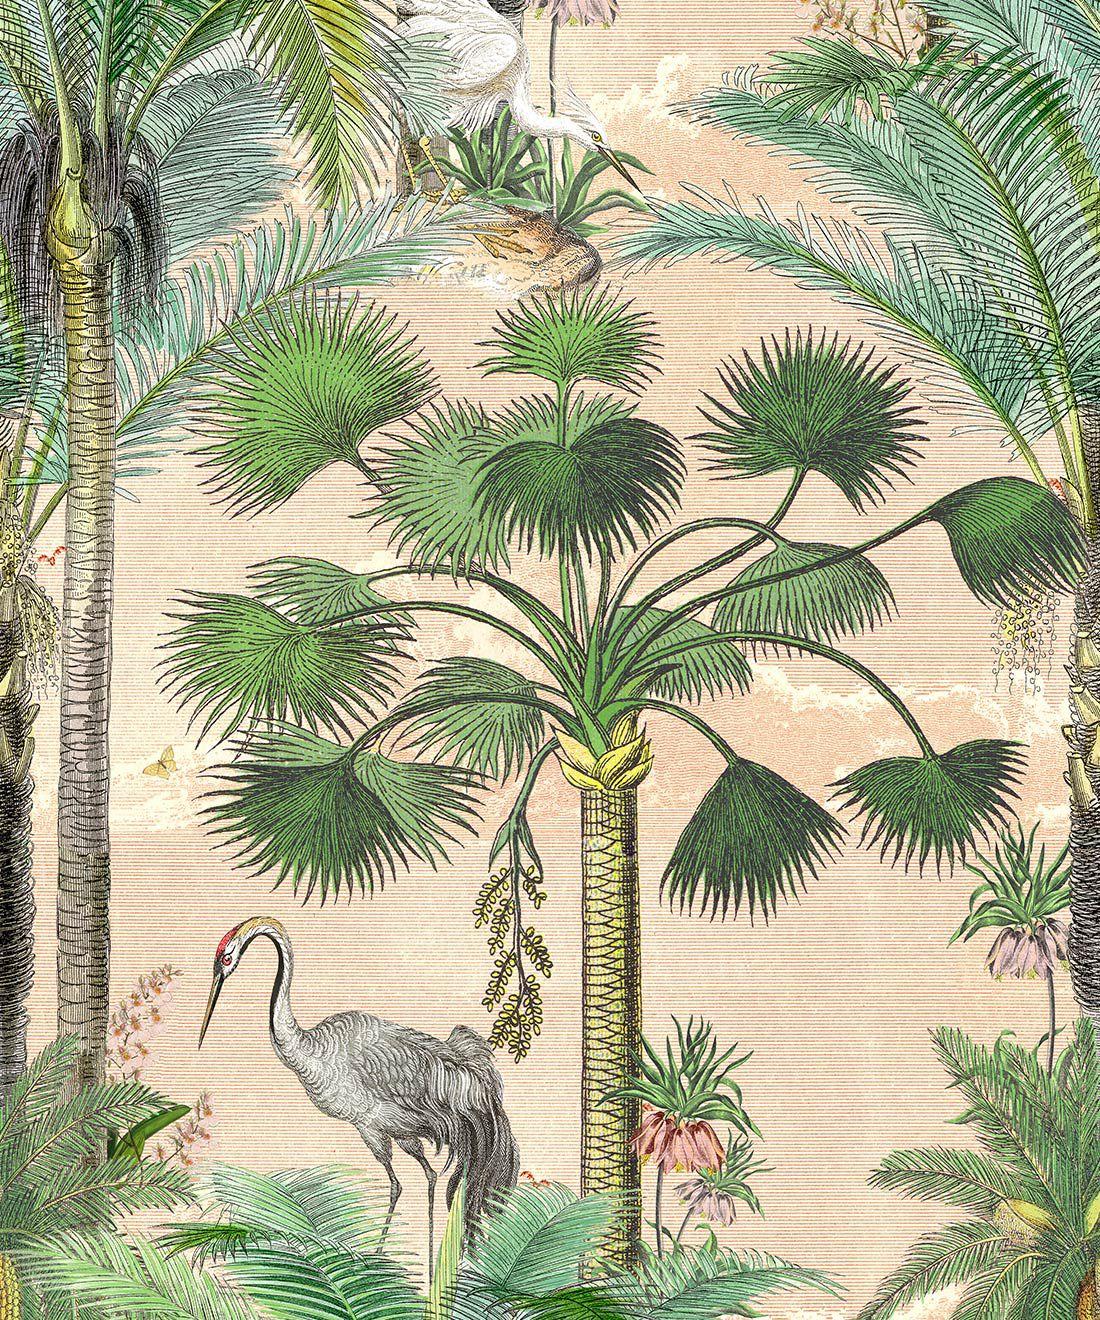 Kerala Palms Mural (2 Panel Set)